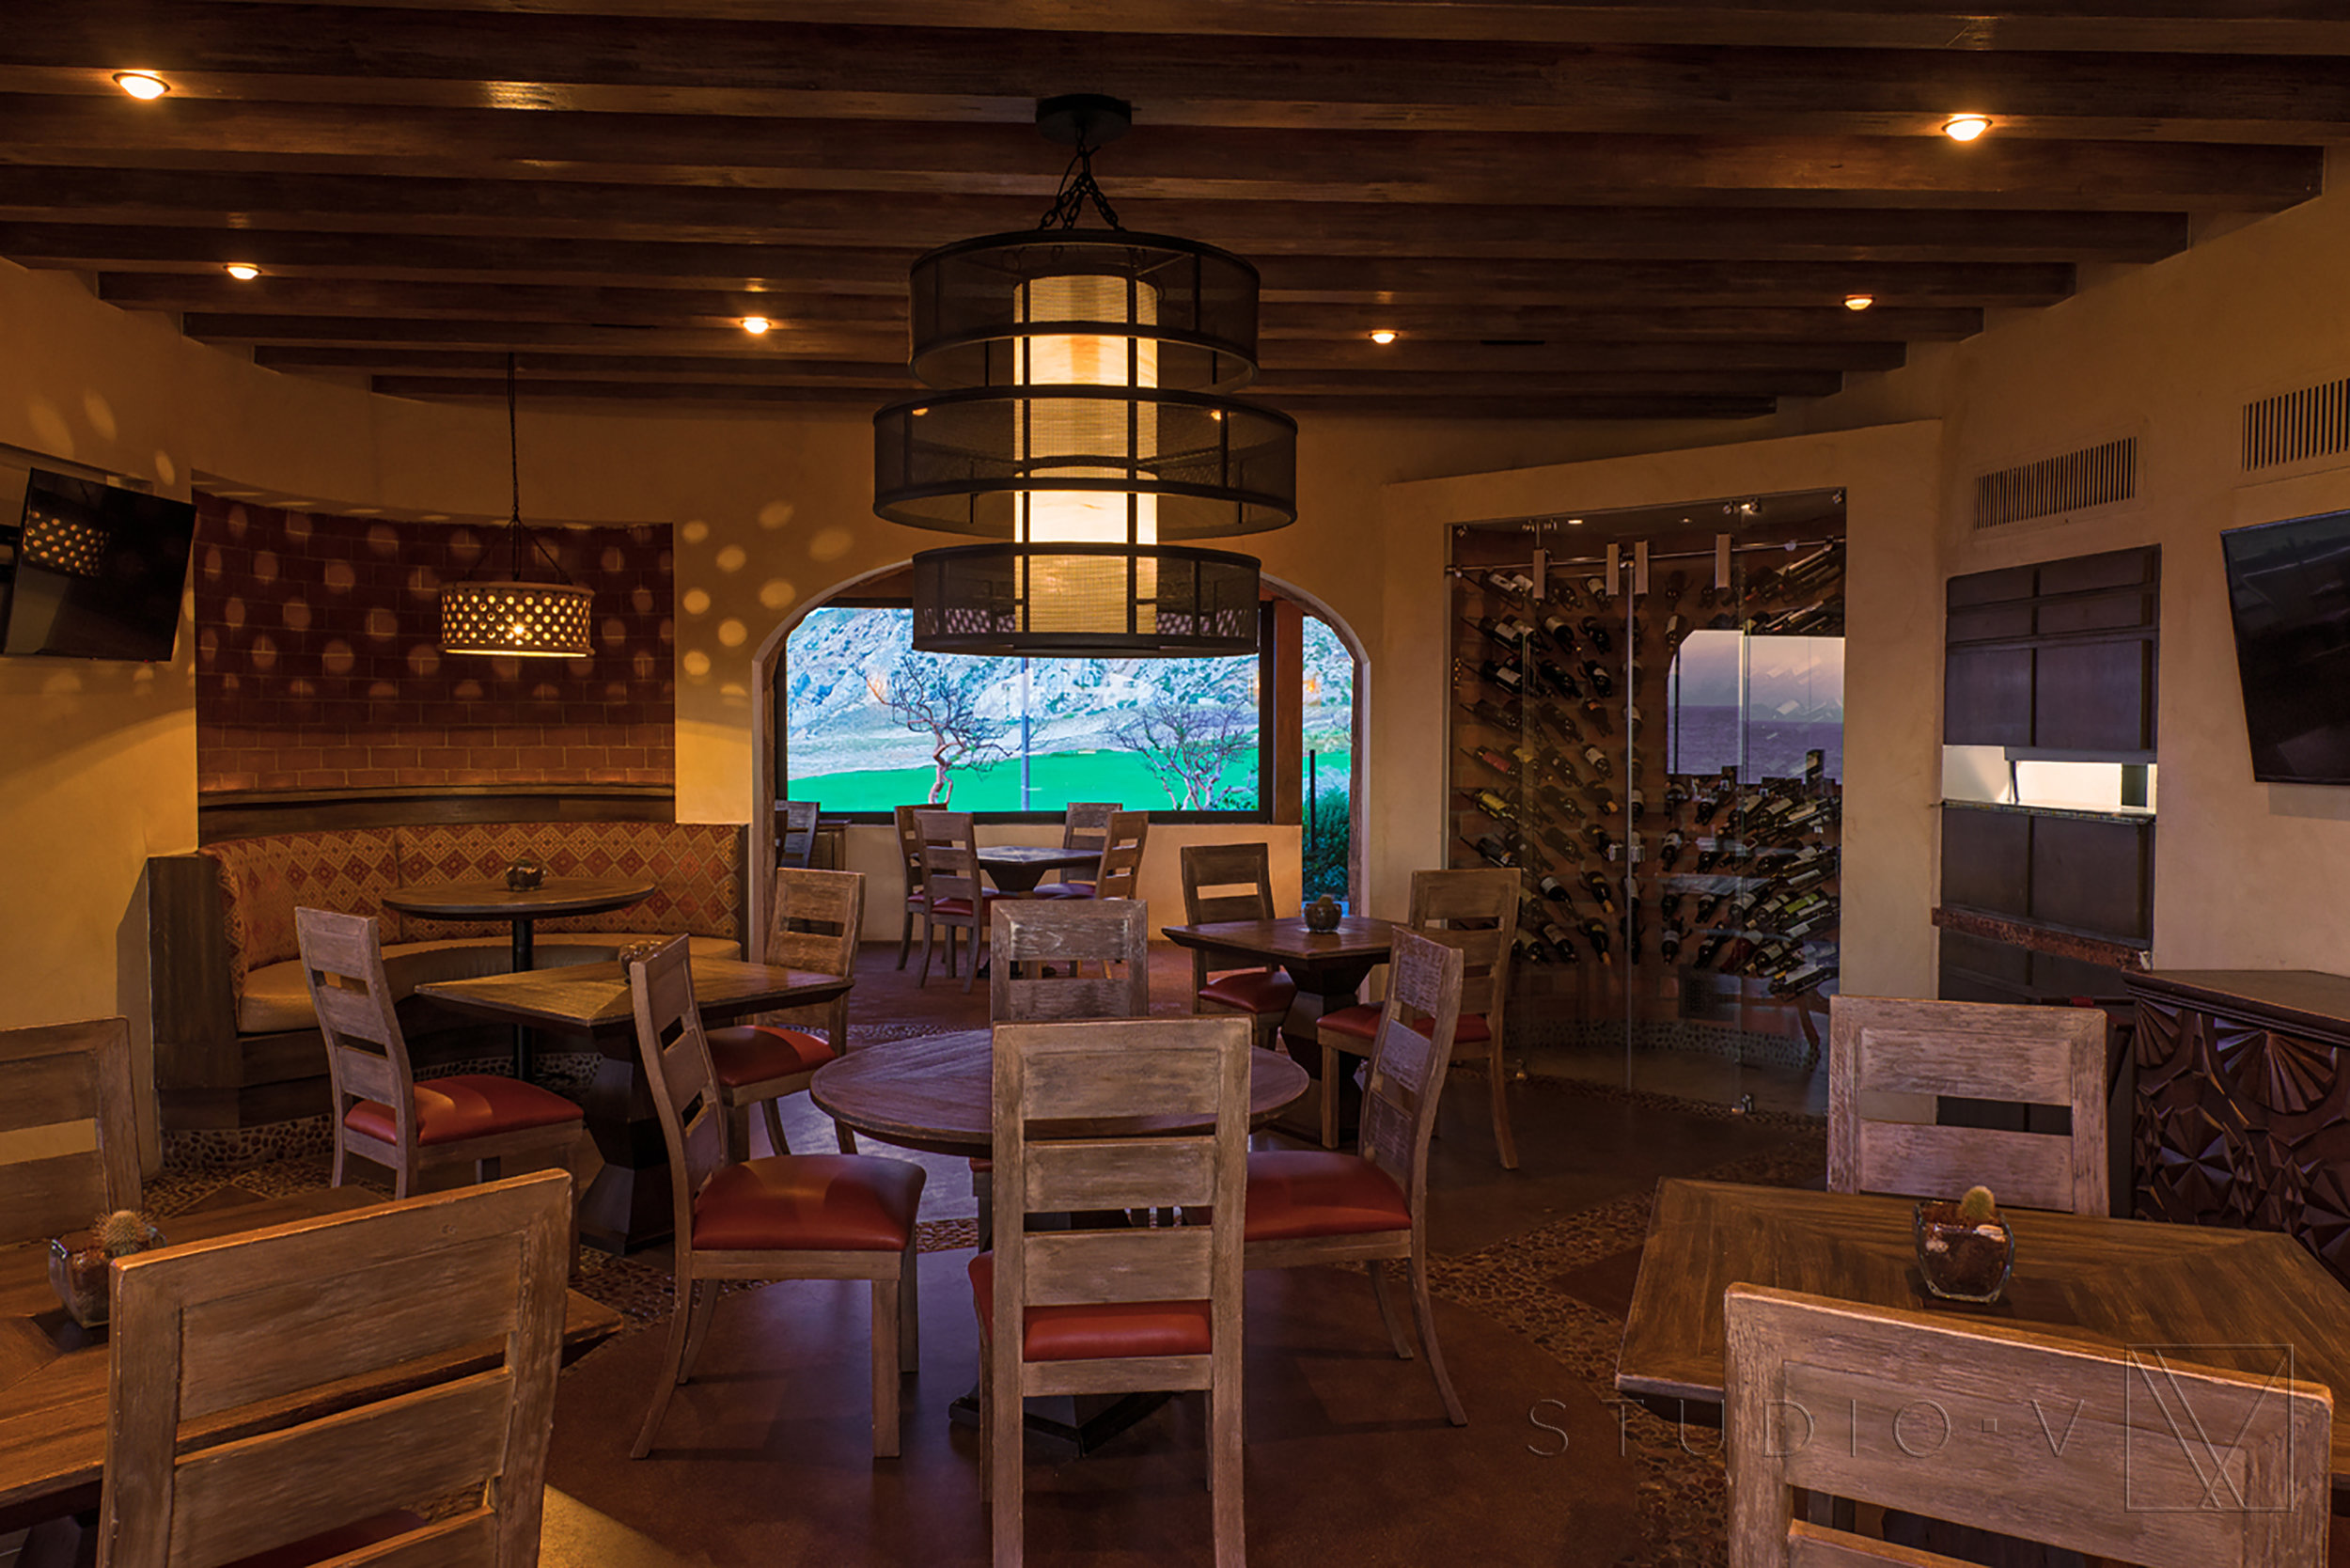 Quivira Clubhouse Sunset Beach Cabo San Lucas Studio V Interior Architecture and Design Scottsdale Arizona AZ (14).jpg